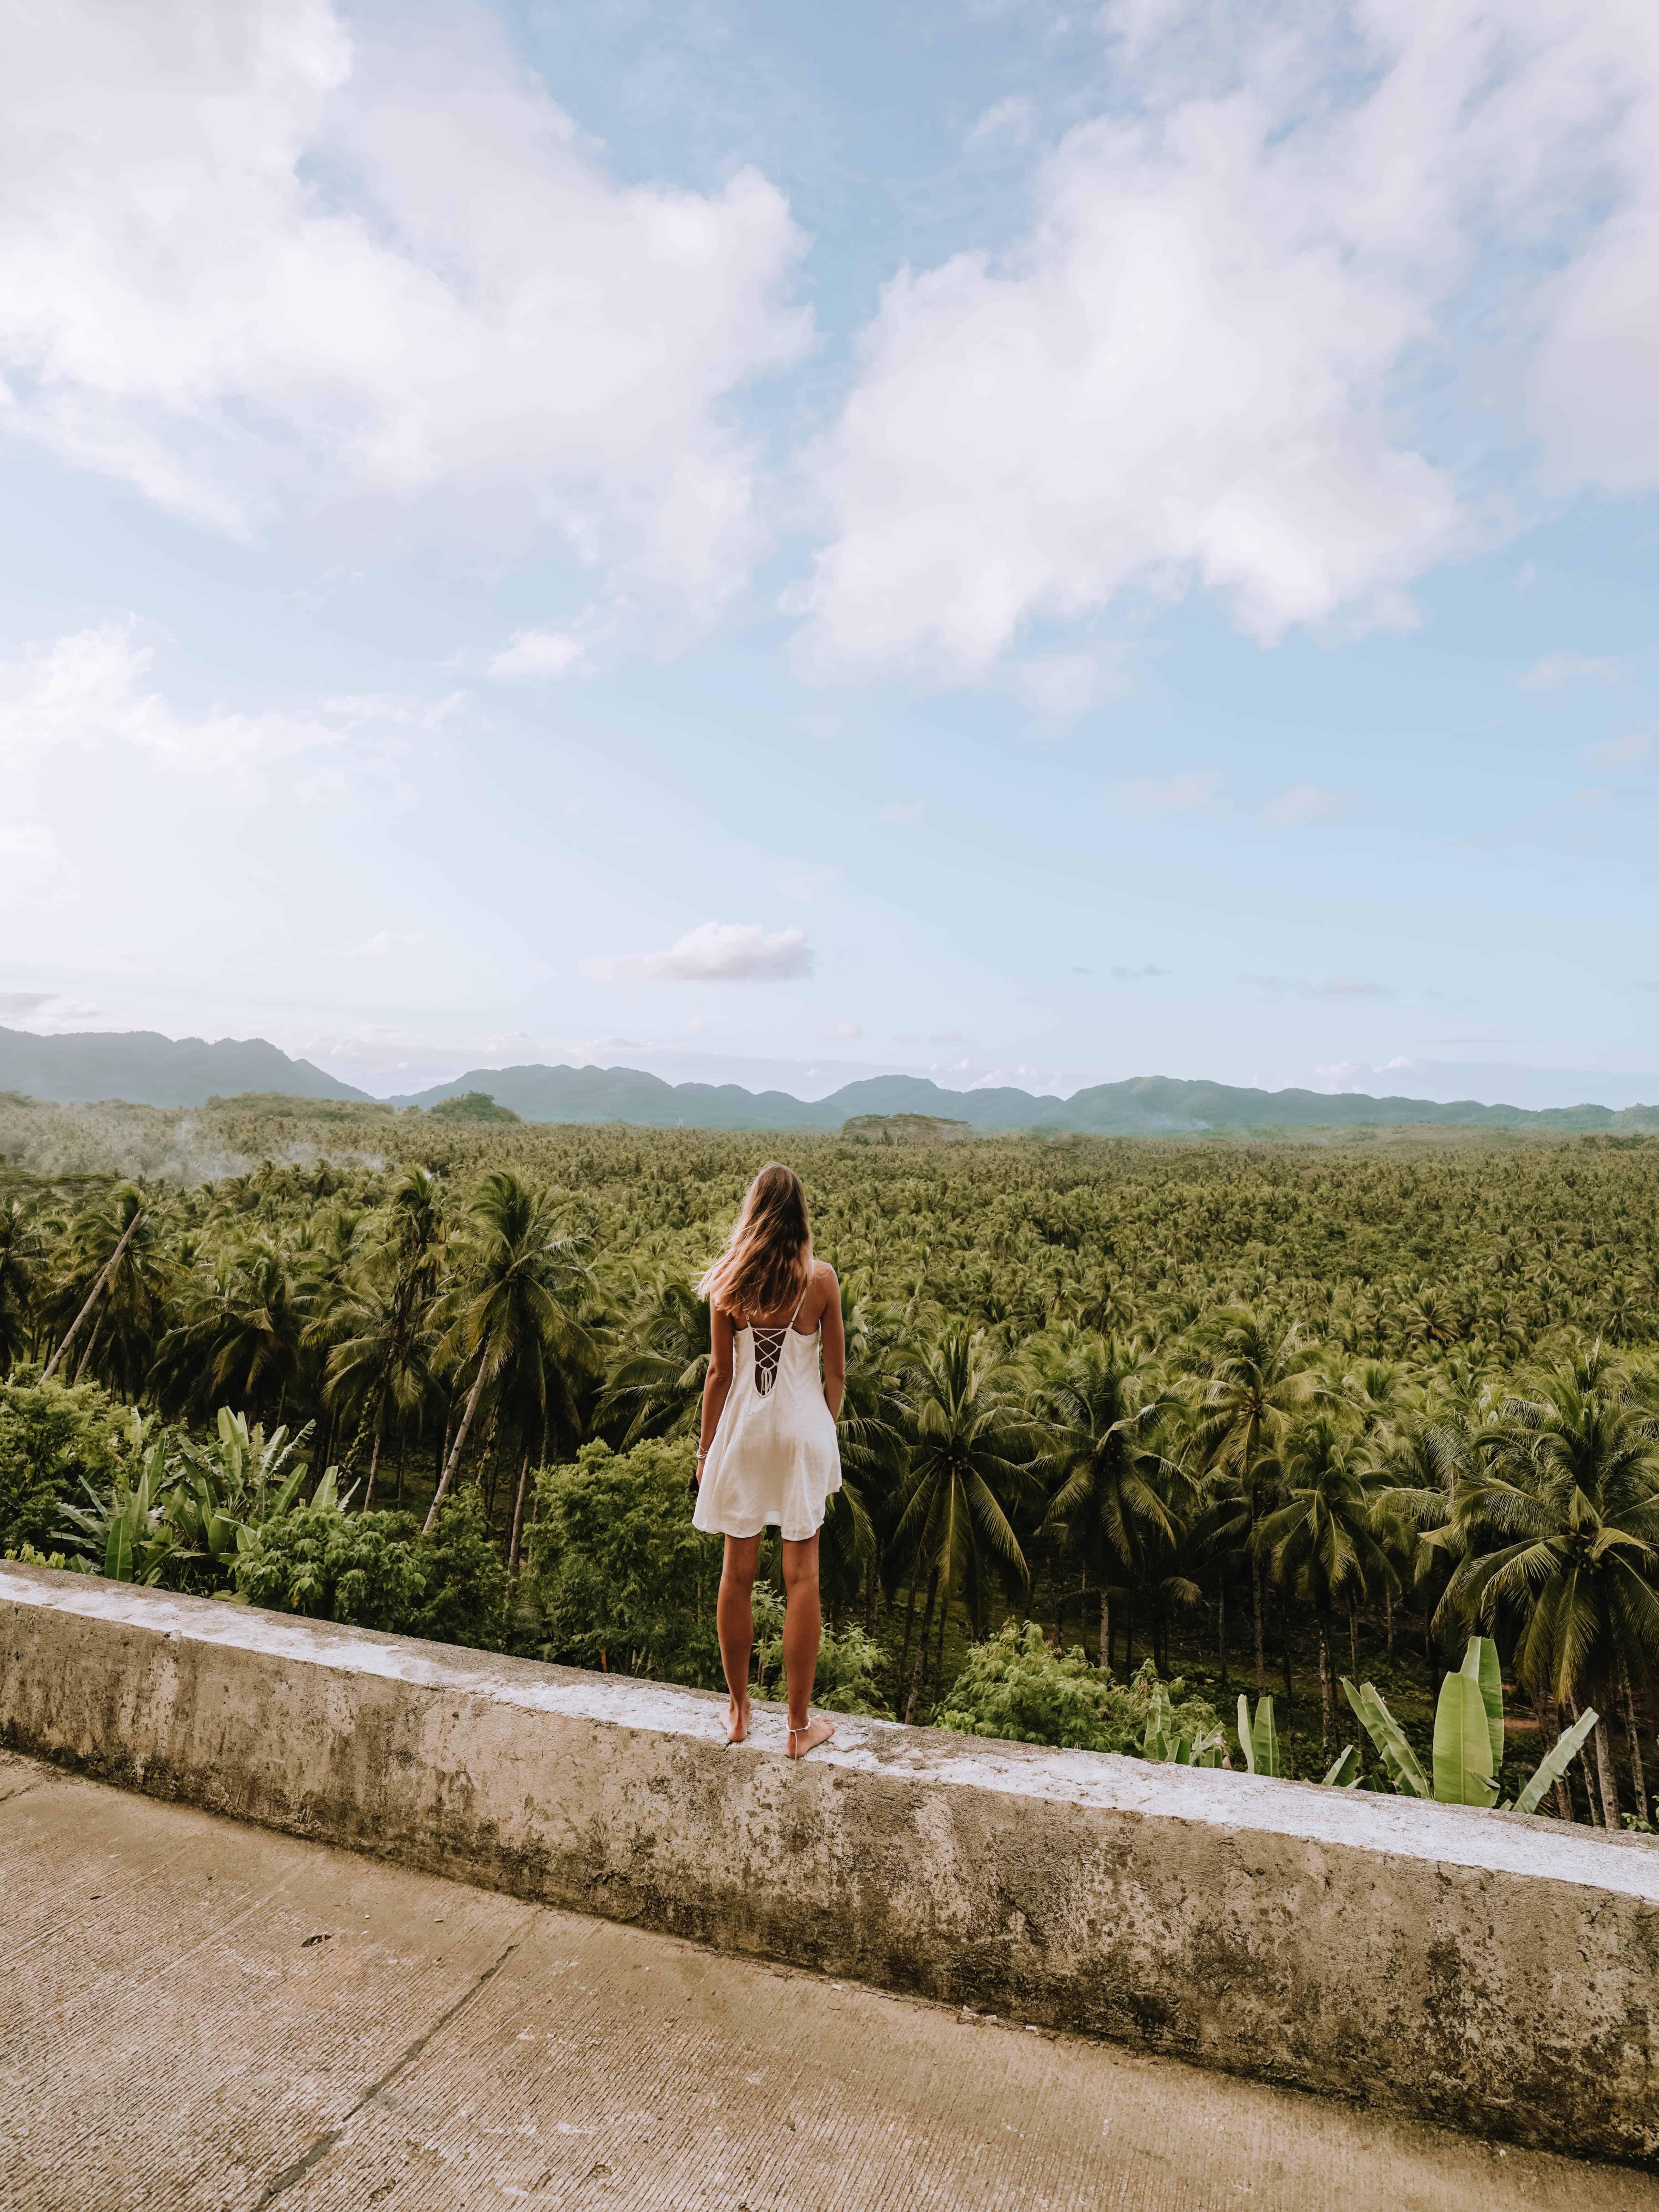 Siargao Palm Tree Viewpoint Woman